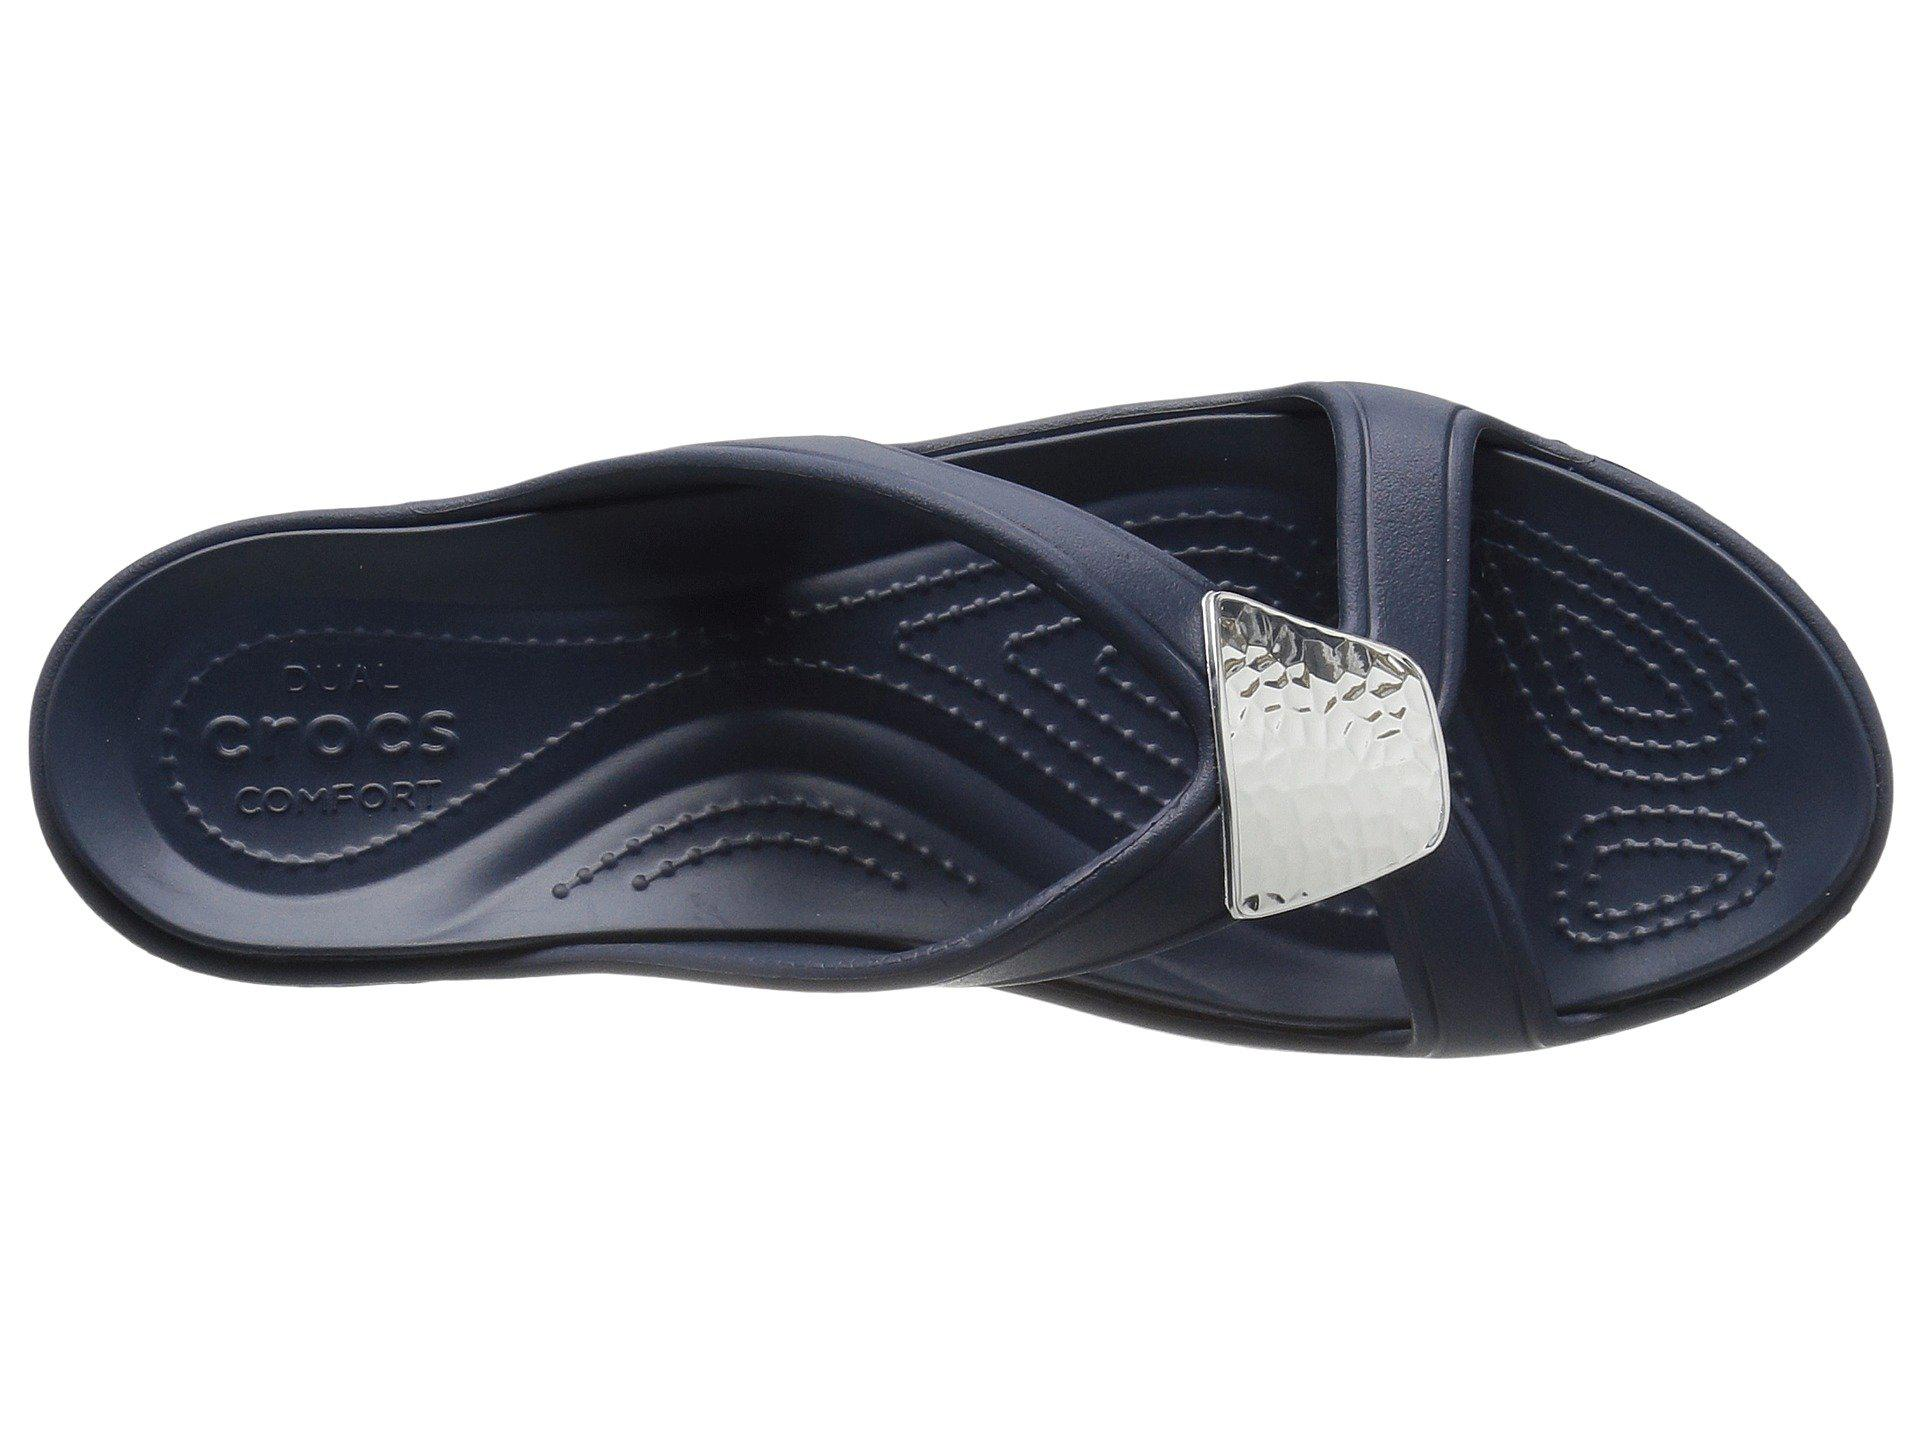 c3eca467a24a Crocs™ - Blue Sanrah Embellished Wedge - Lyst. View fullscreen